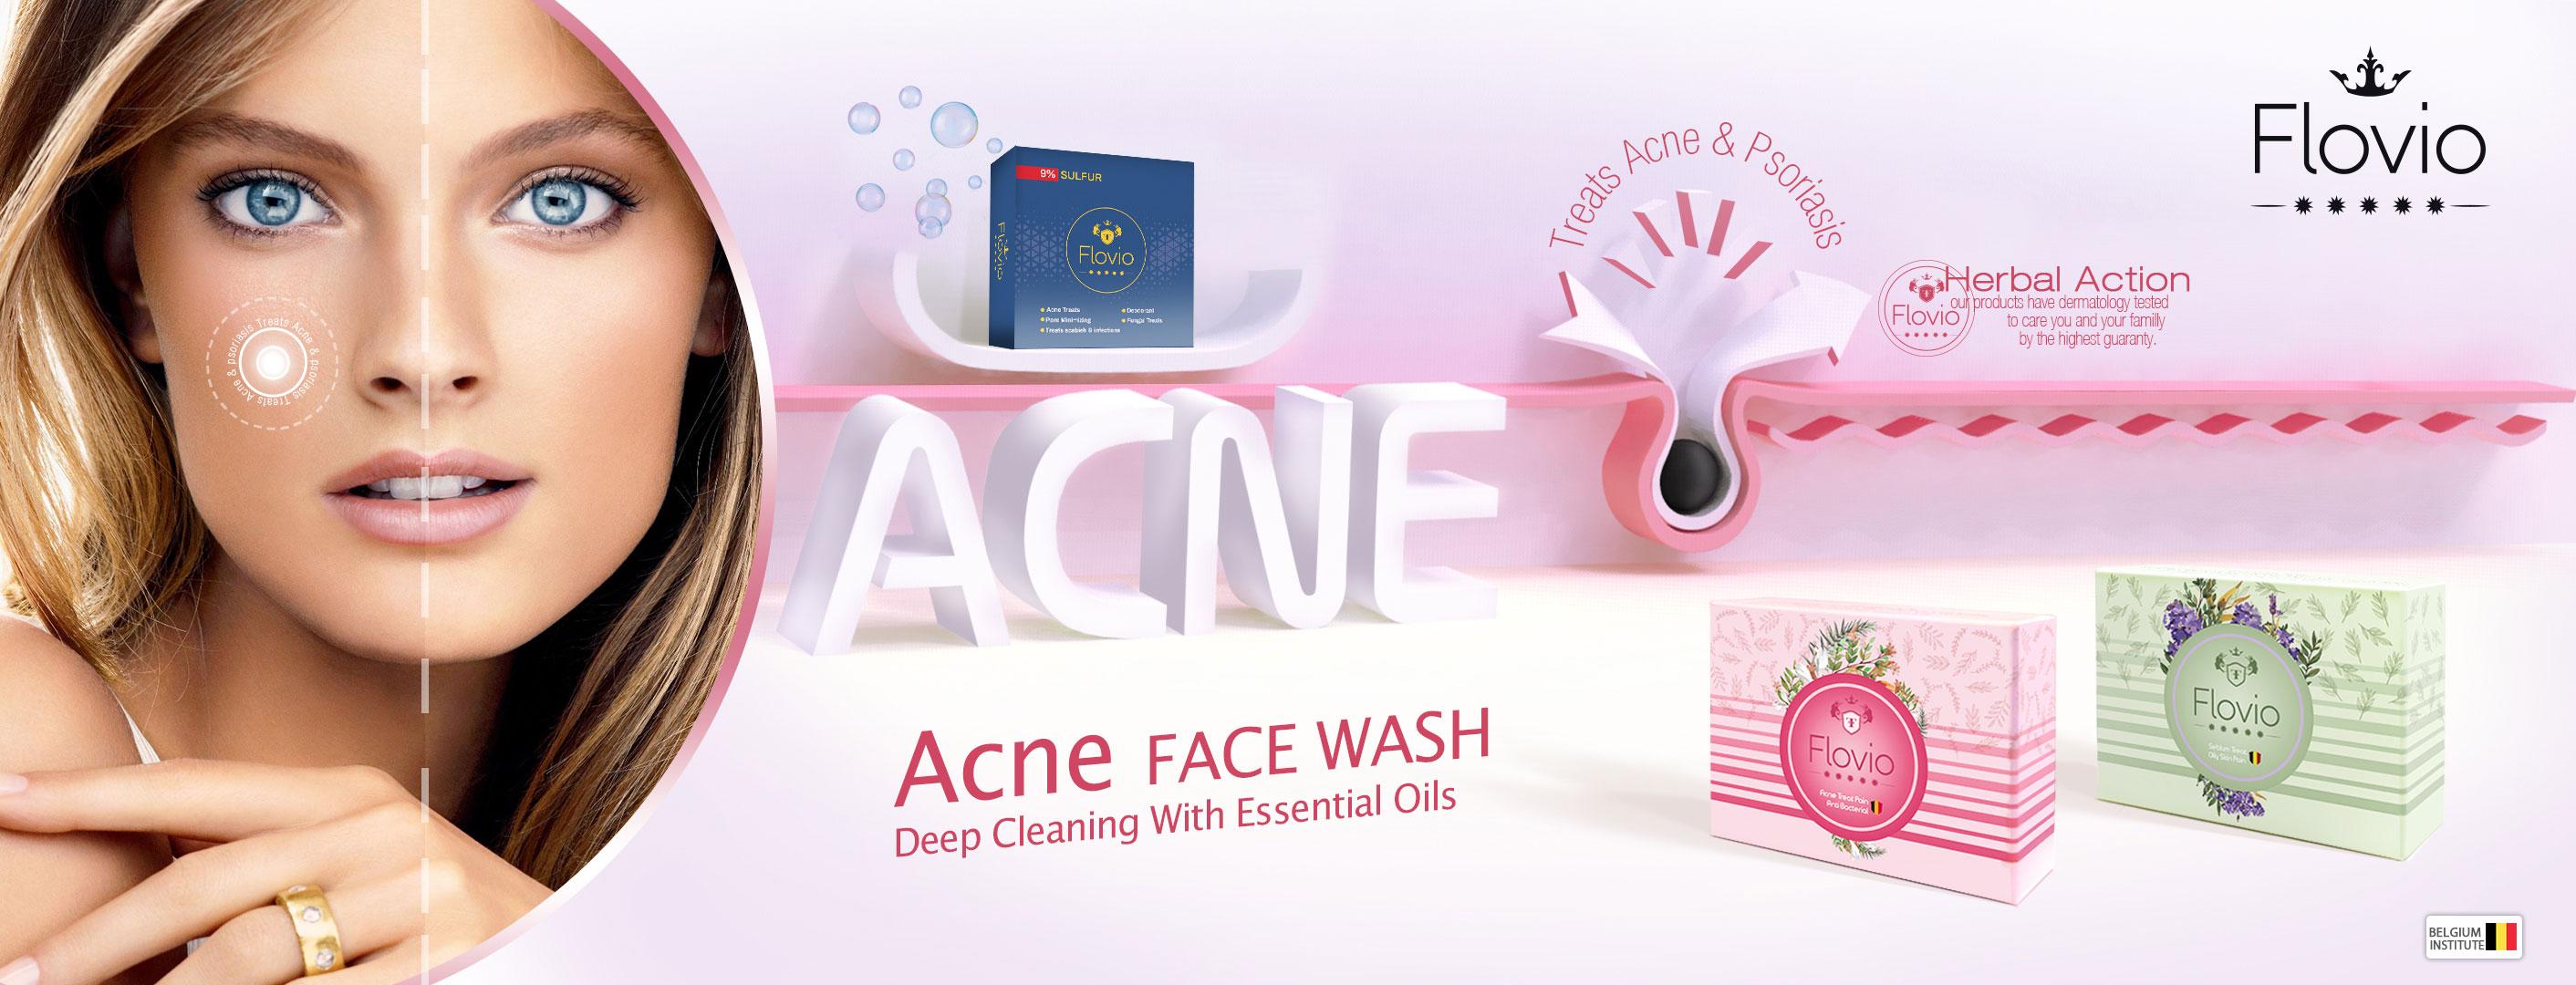 flovio-banner-acne